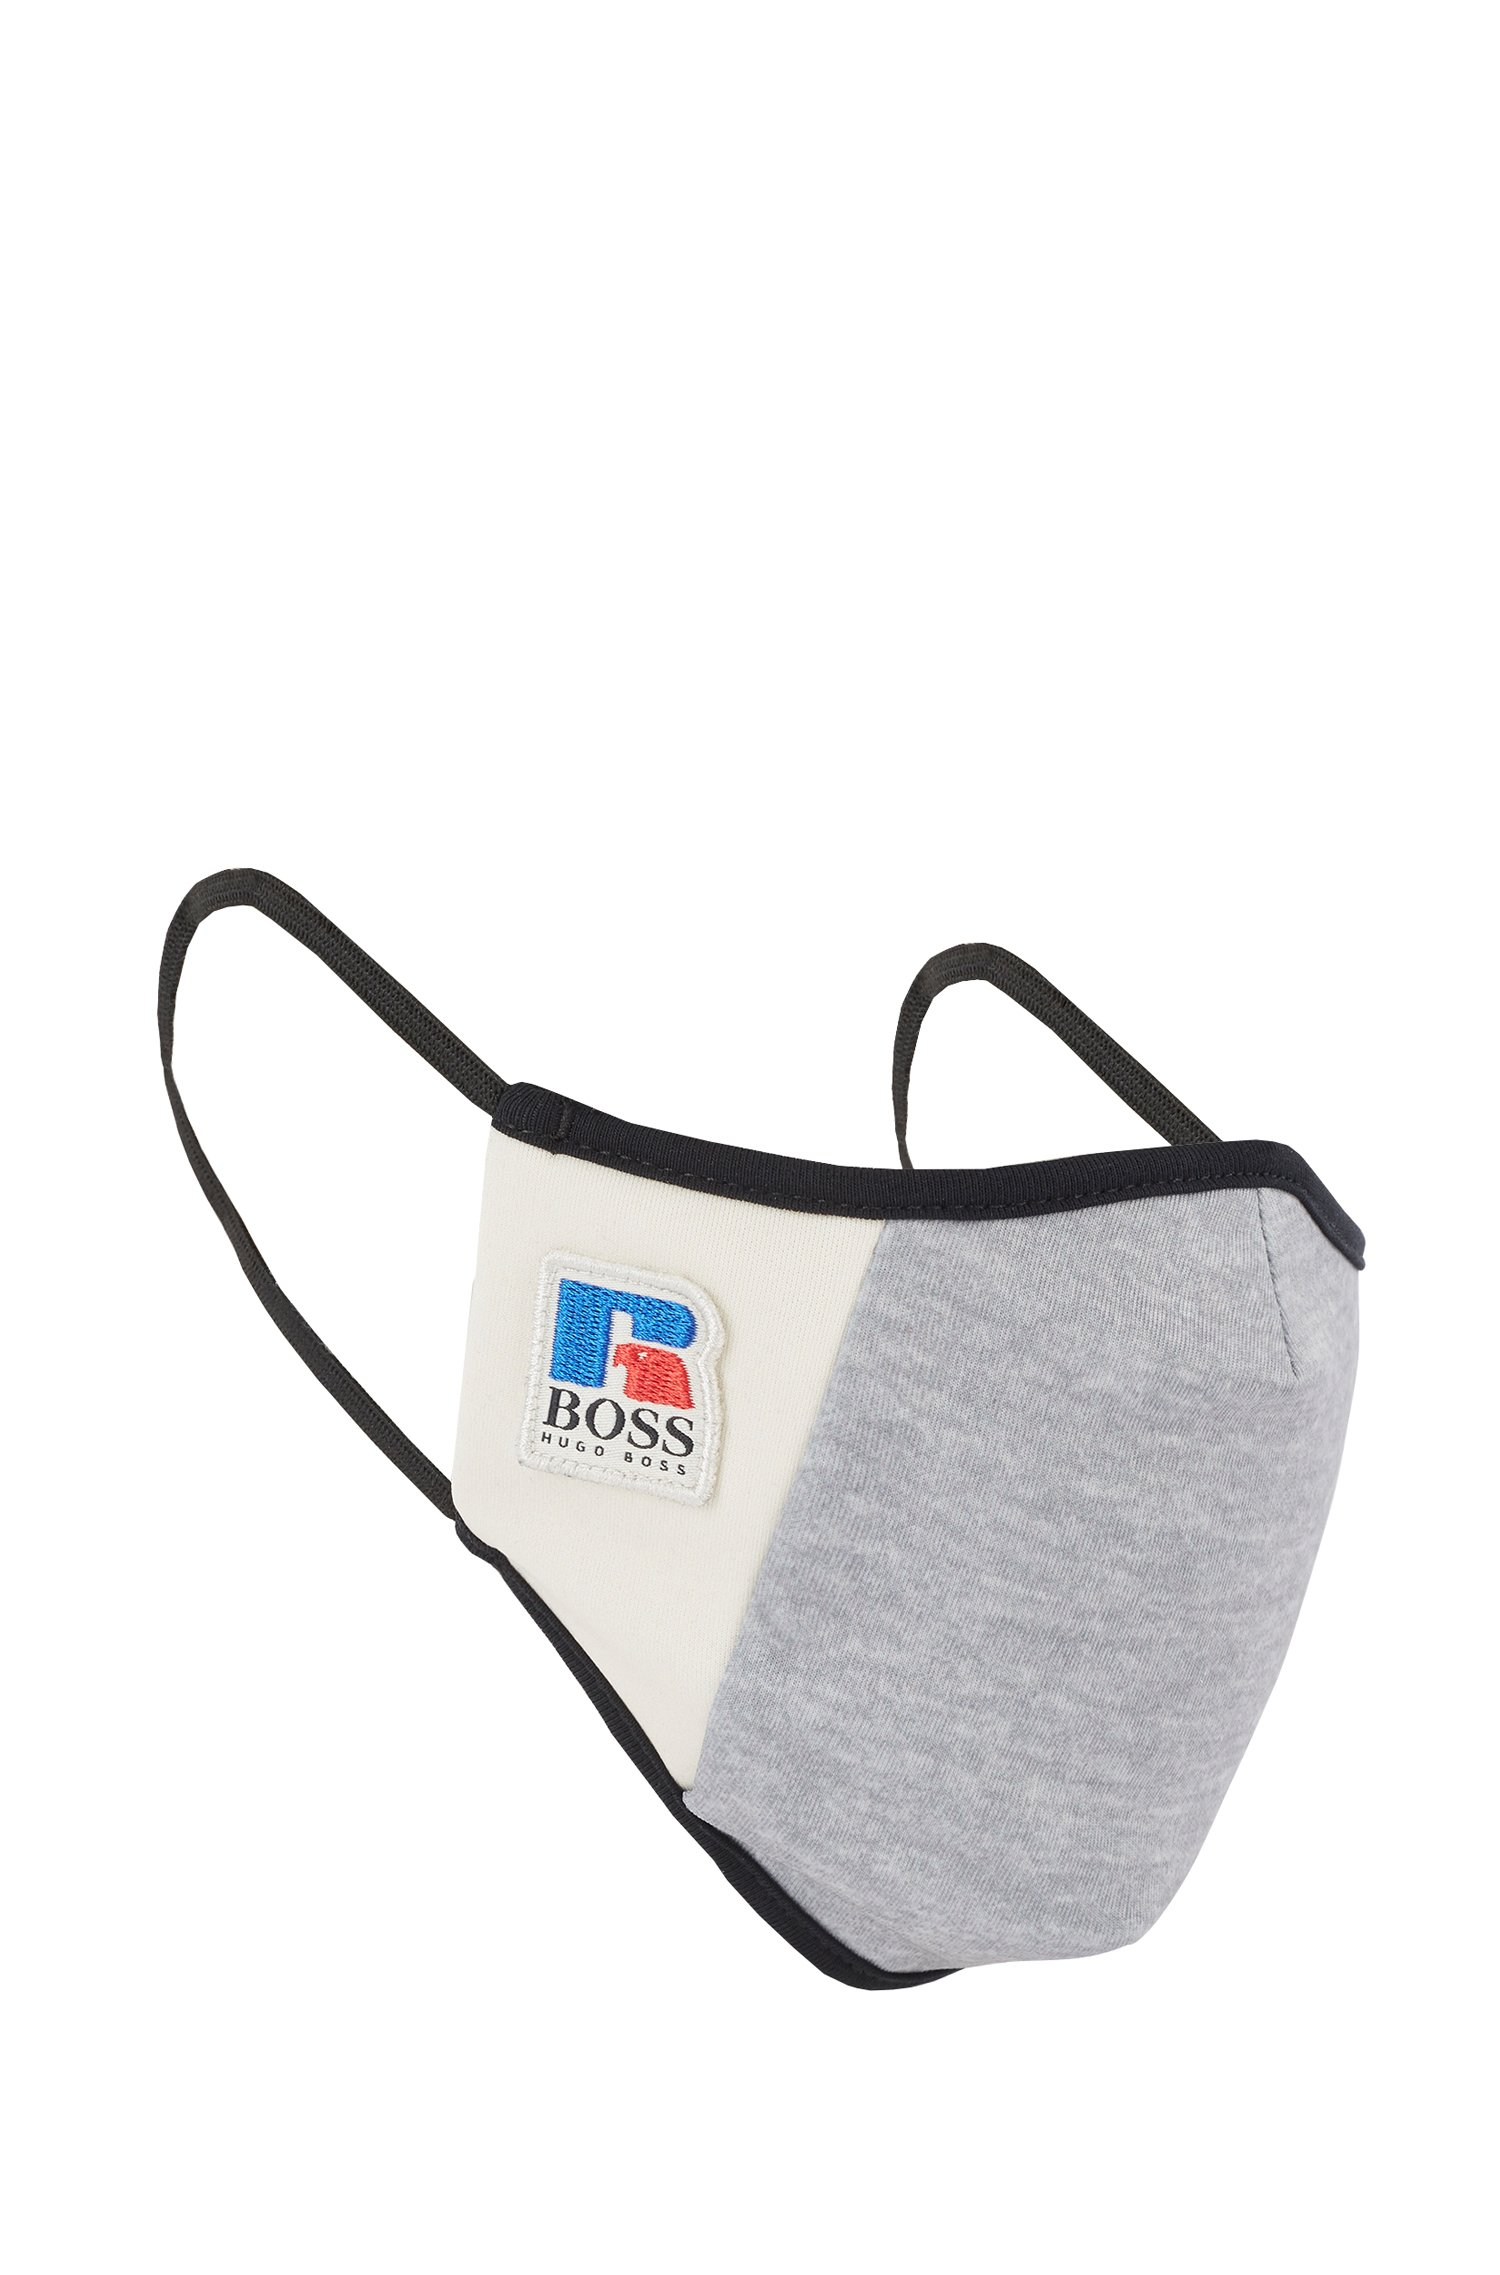 Masque en tissu interlock stretch avec logo exclusif, Gris